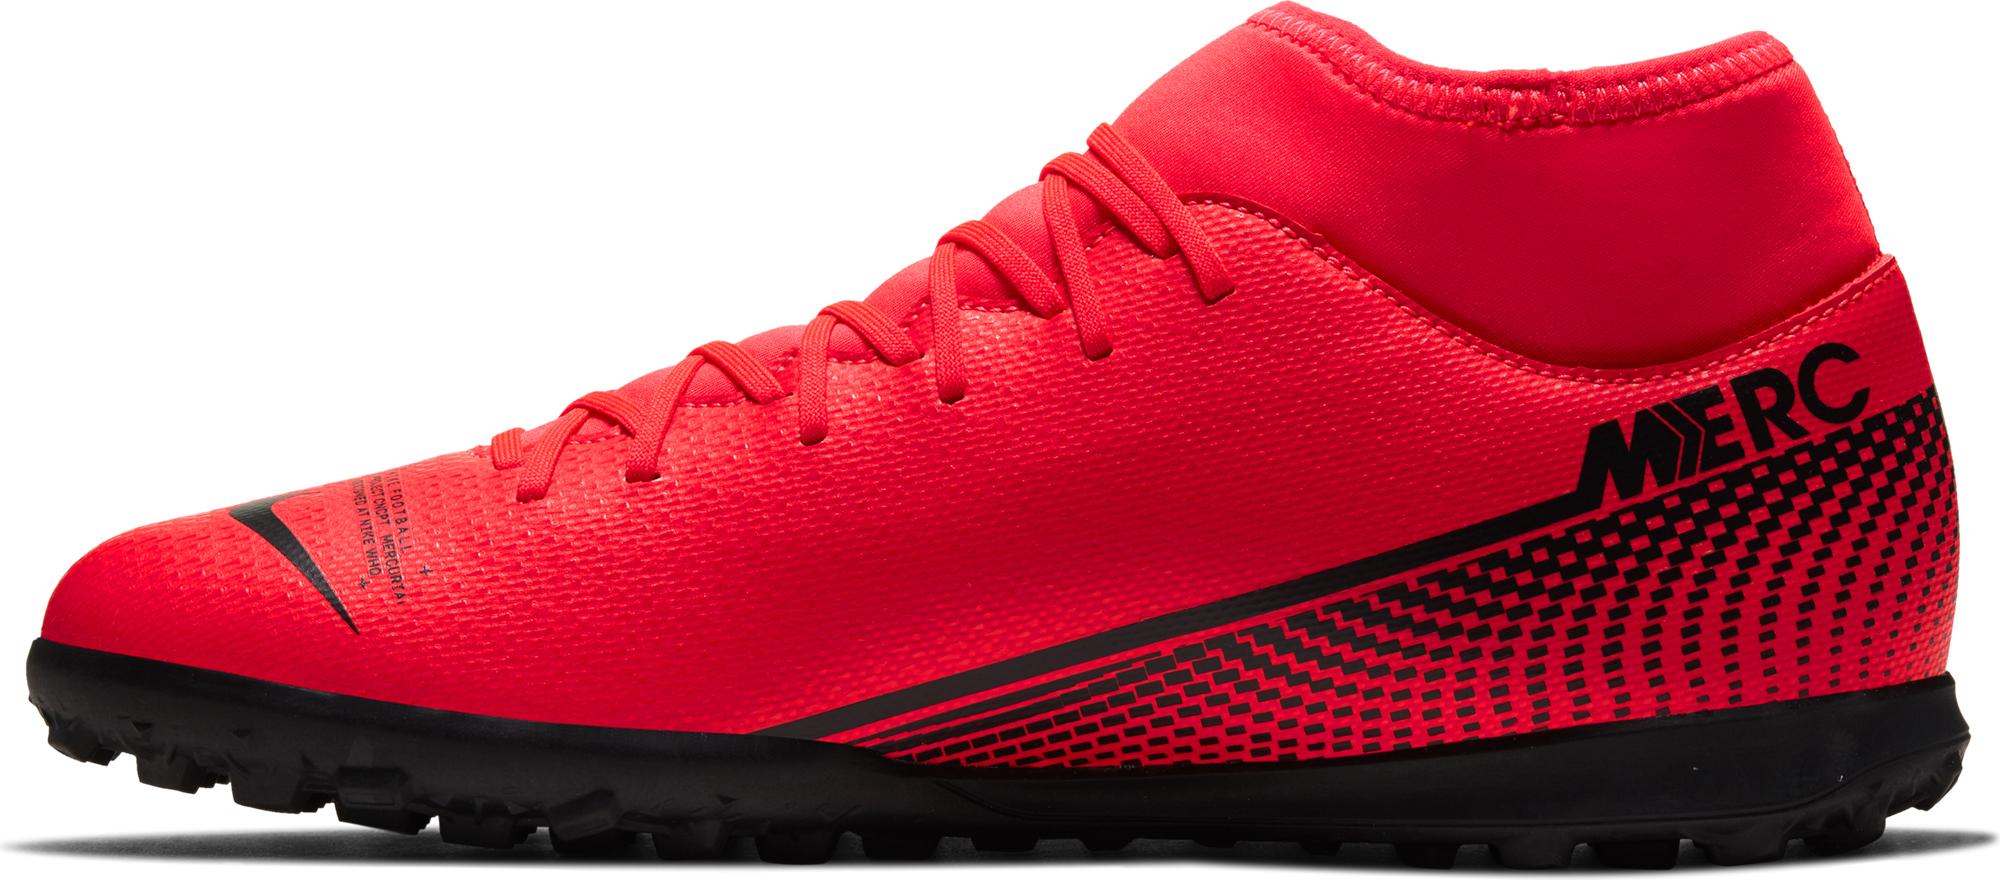 Nike Бутсы мужские Nike Mercurial Superfly 7 Club TF, размер 45 цена 2017